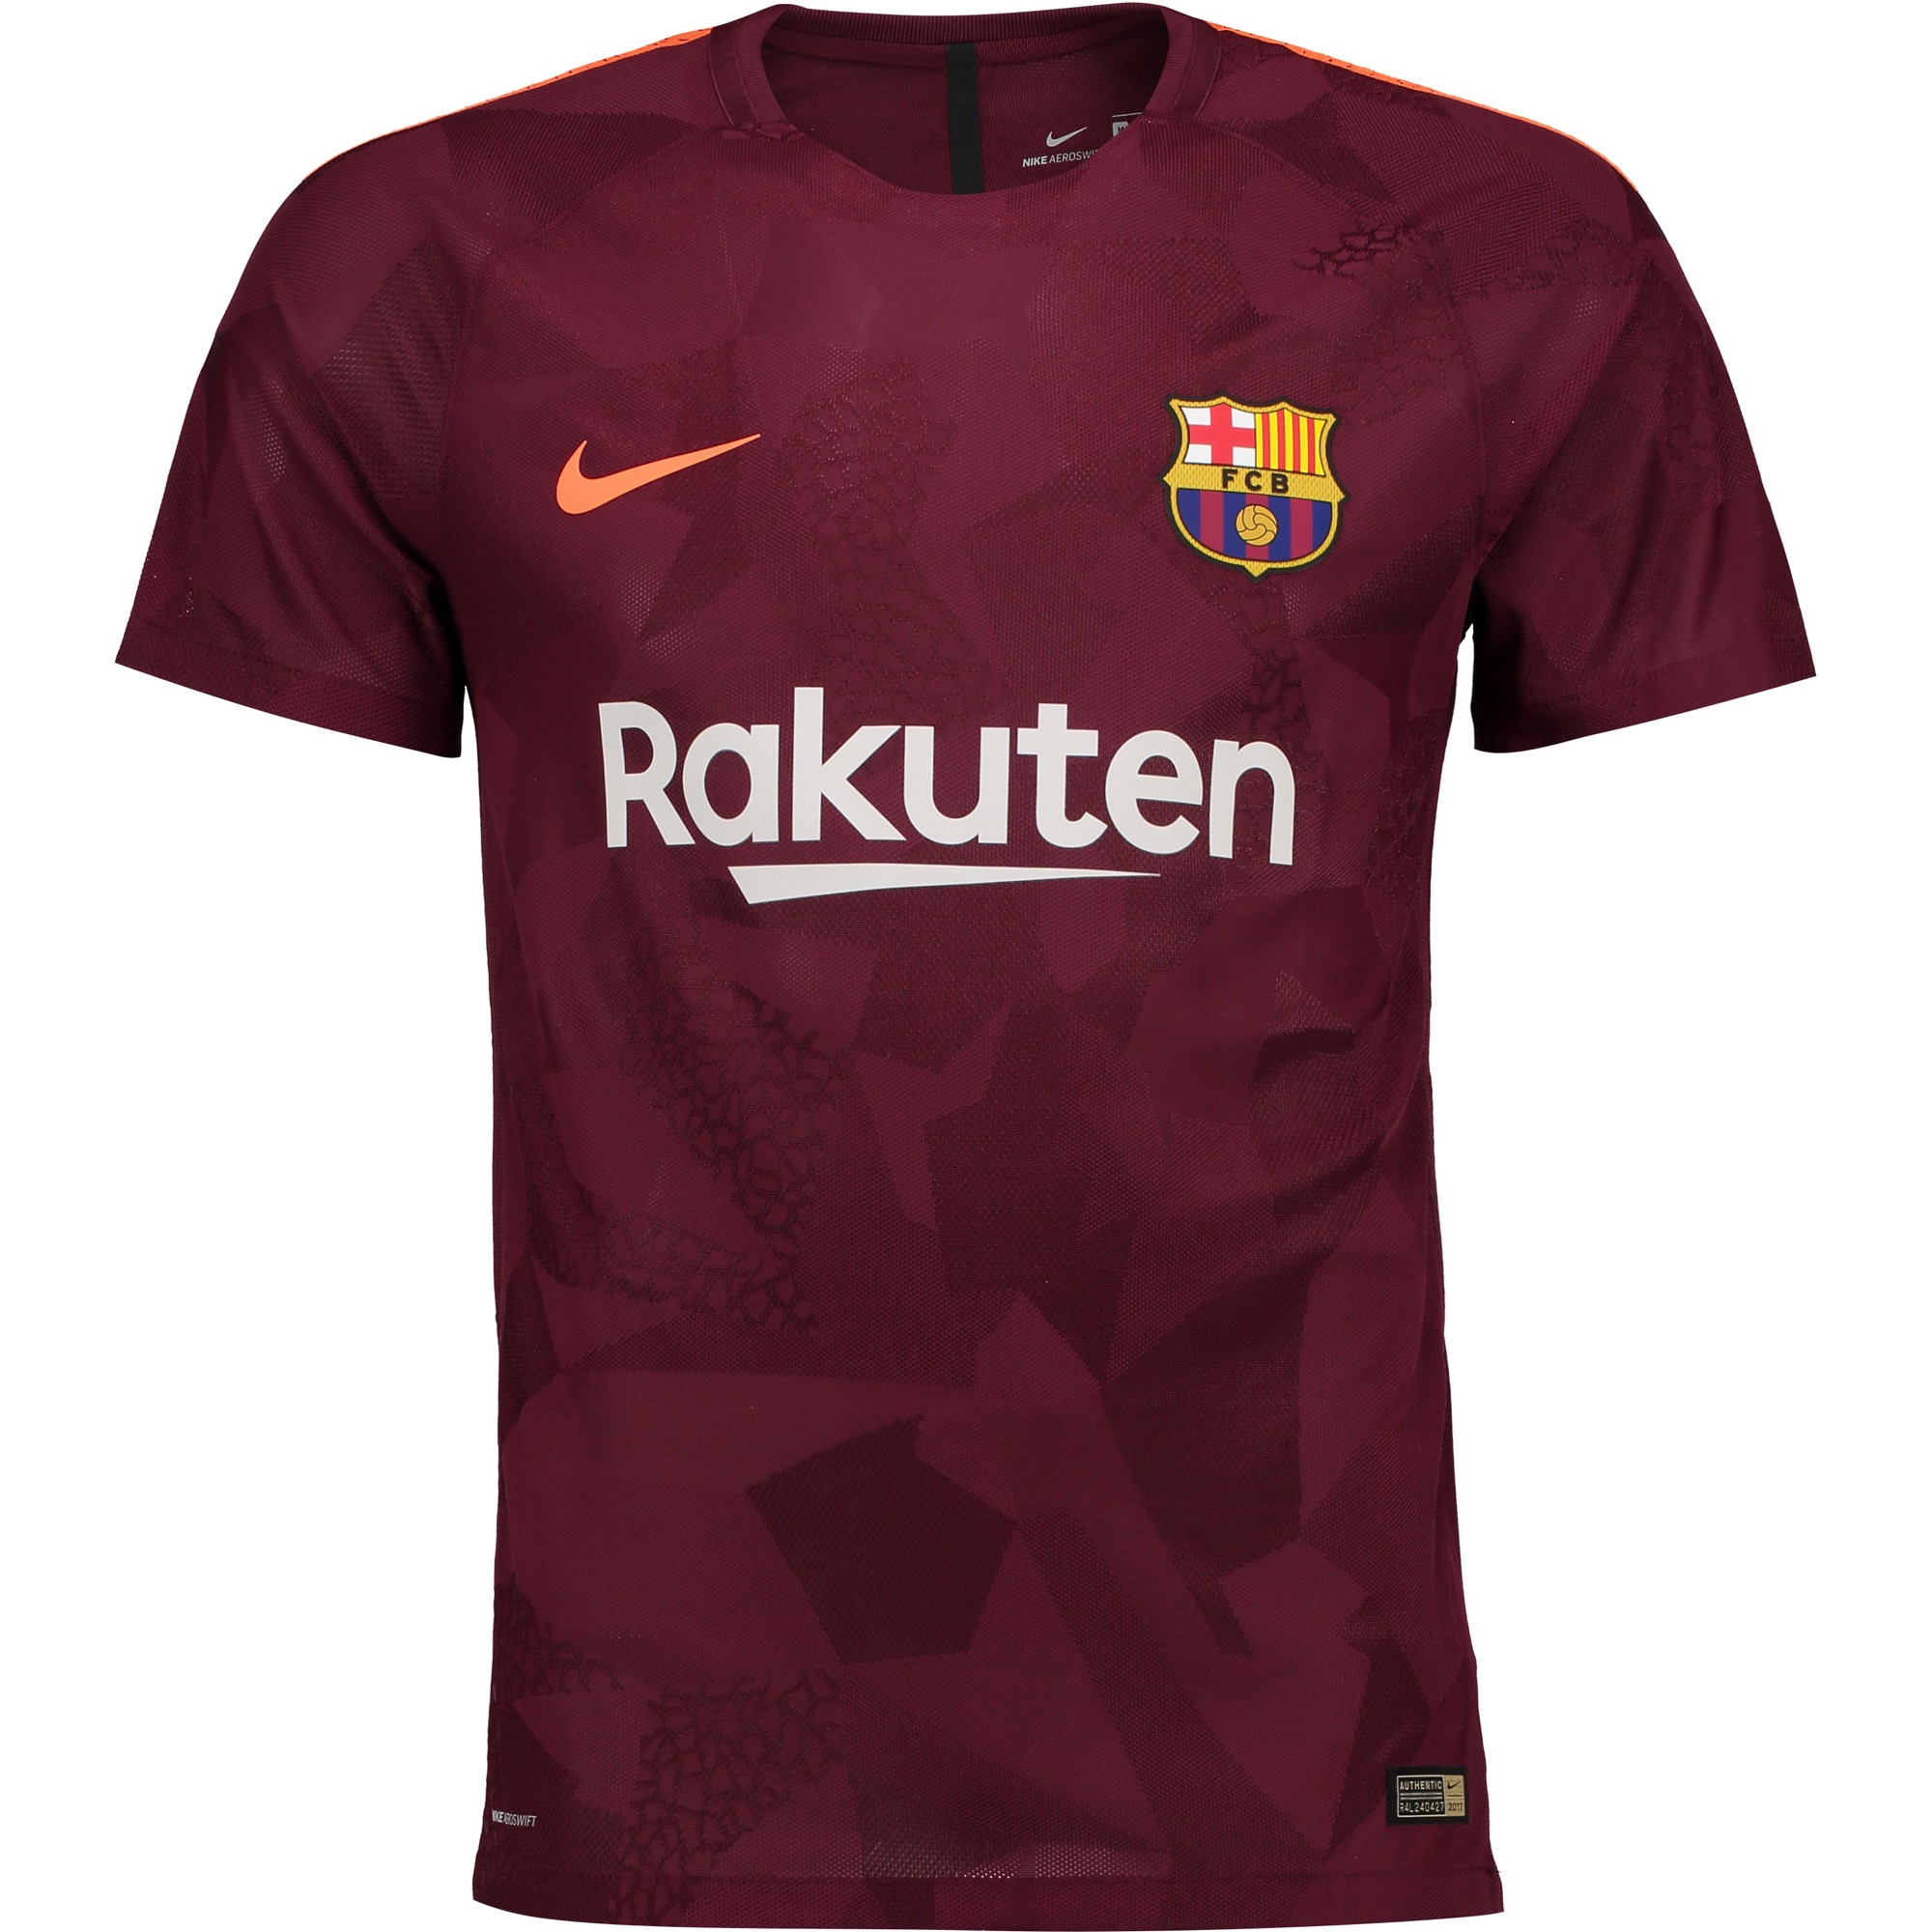 meet 96dc2 28d3c Barcelona 17/18 Nike Third Kit | 17/18 Kits | Football shirt ...